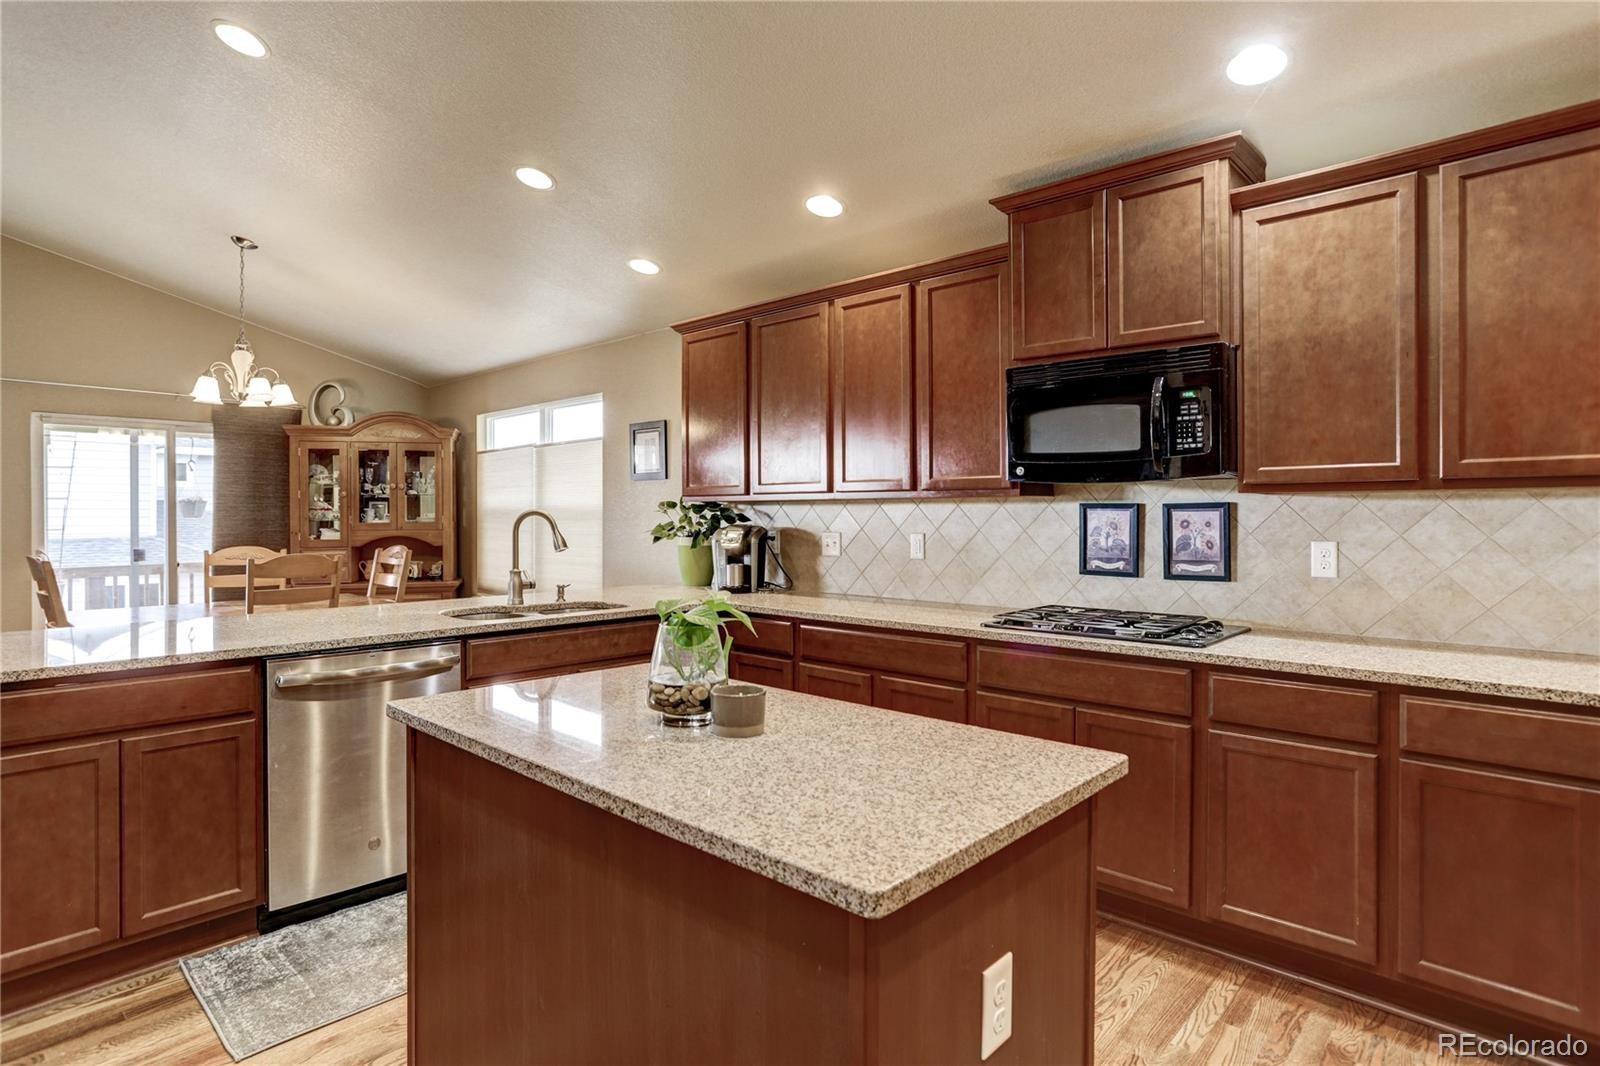 MLS# 8122893 - 4 - 2905 Saratoga Trail, Frederick, CO 80516